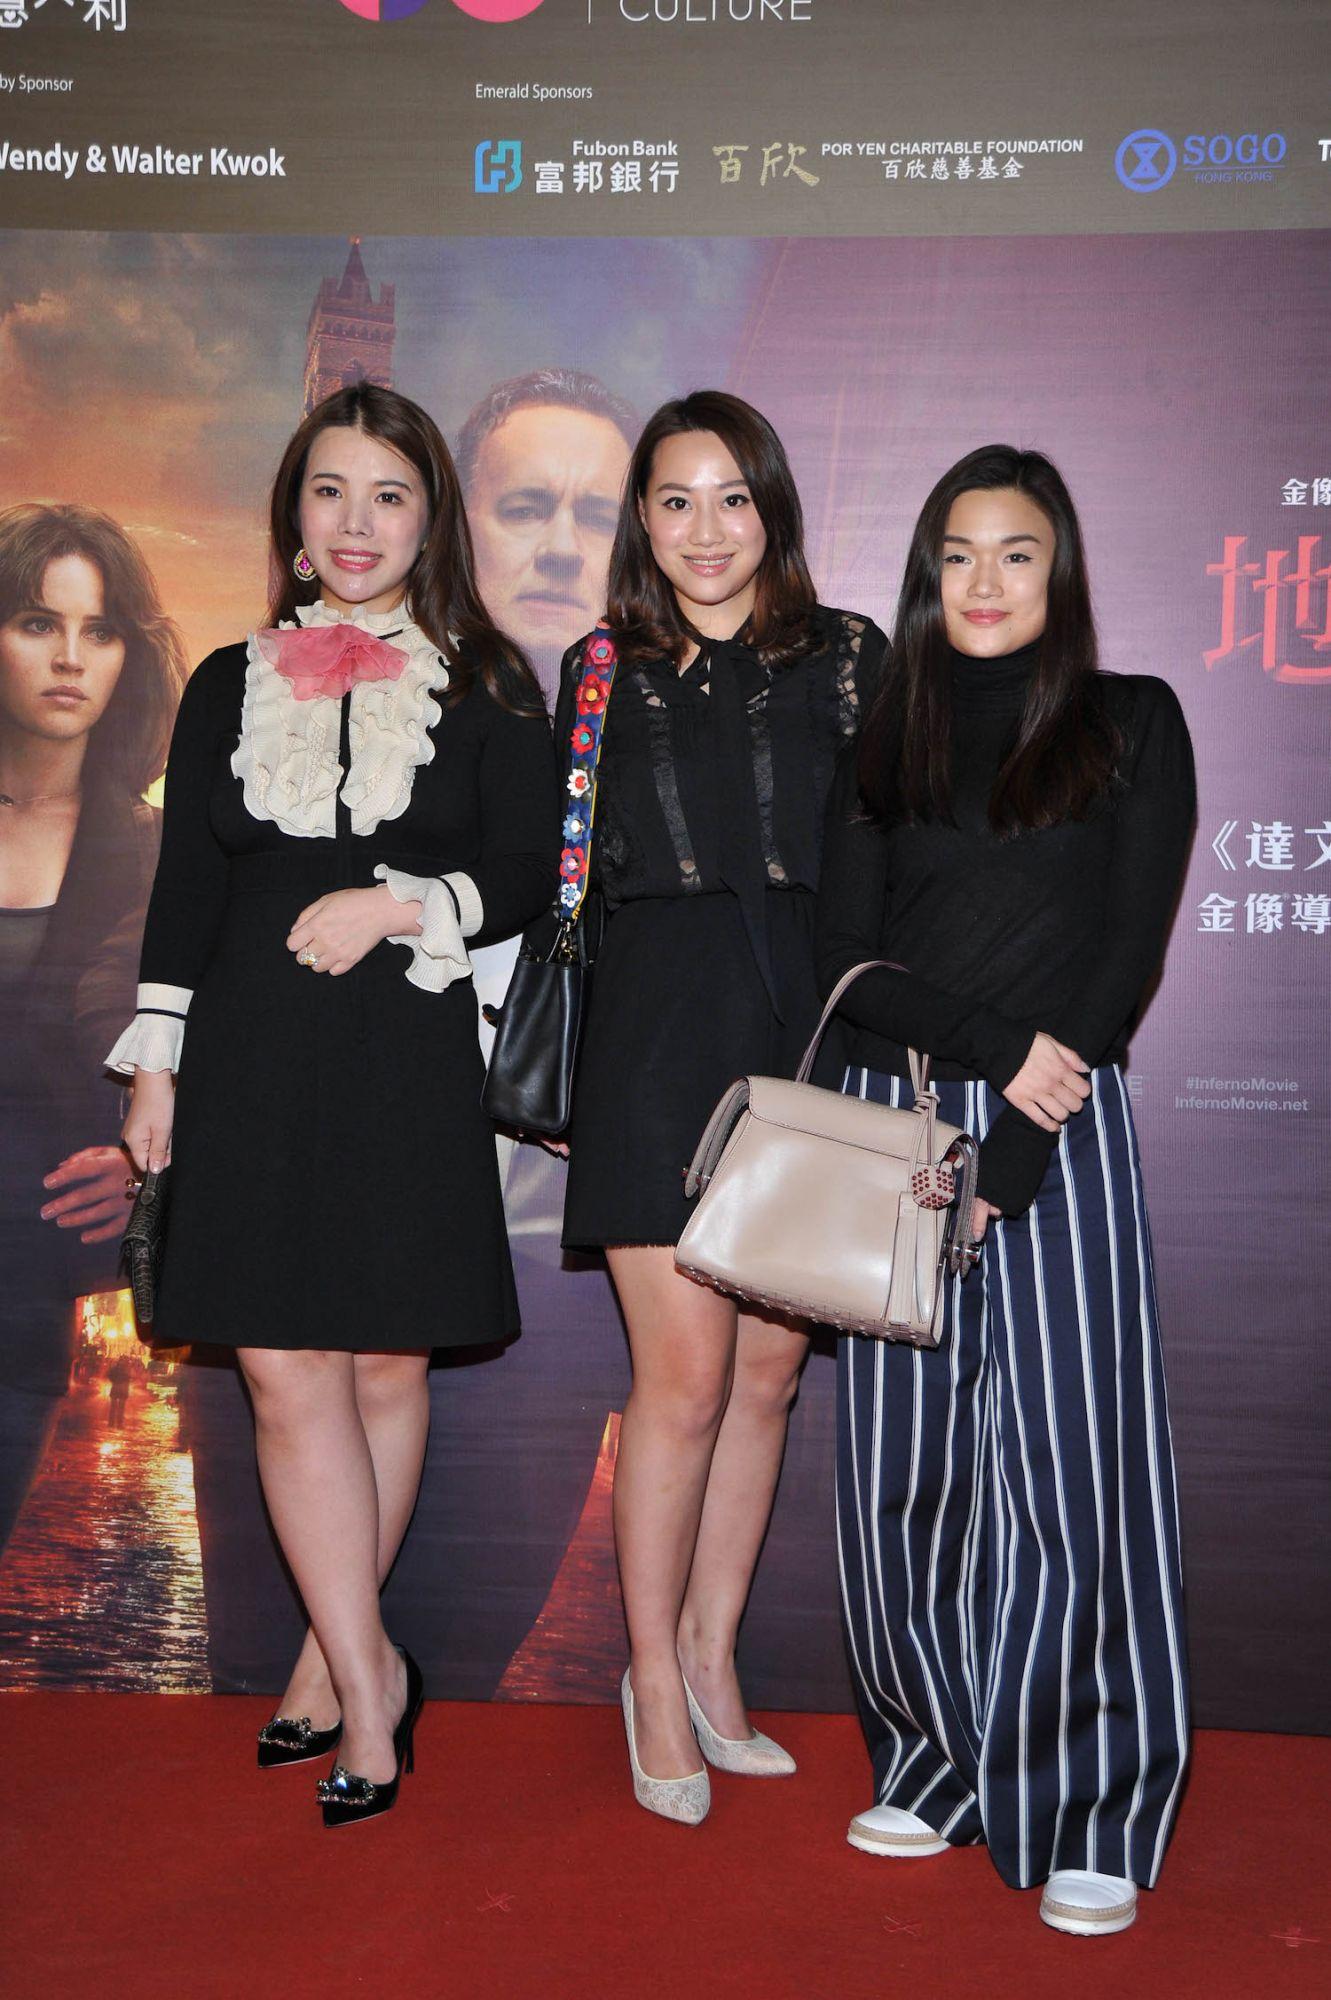 Wendy Yu, Josephine Chiu and Queenie Rosita Law